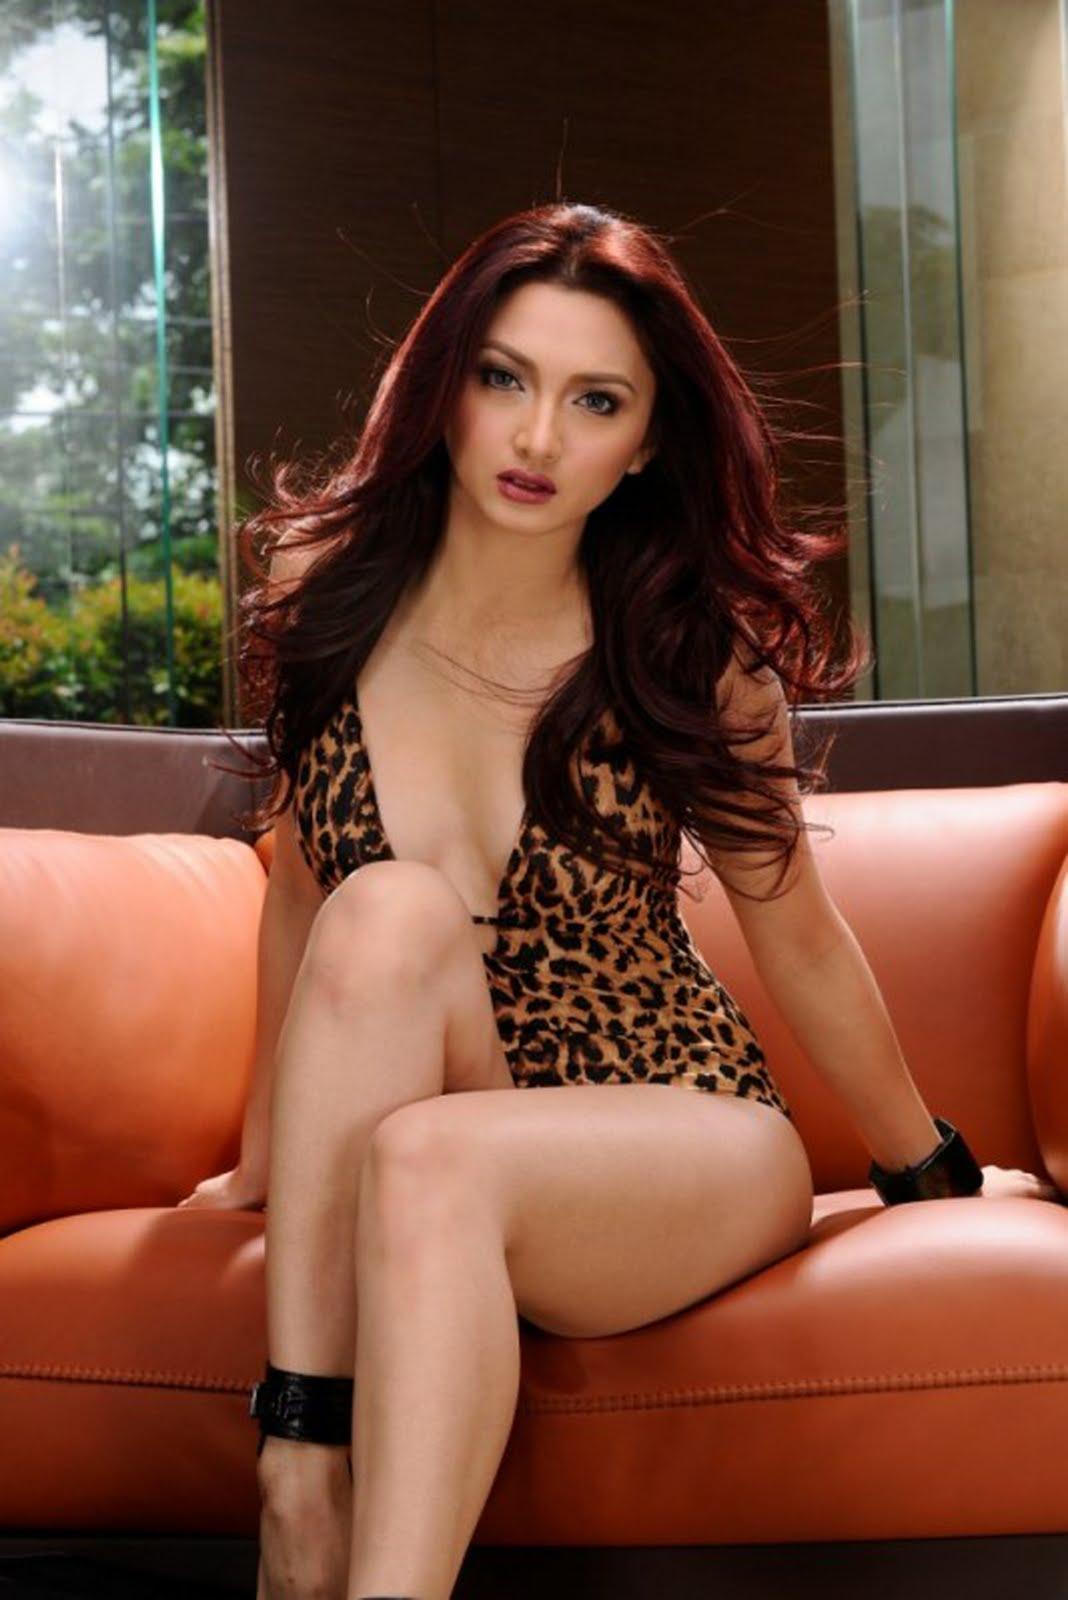 iya villania sexy tanduay calendar photo 01